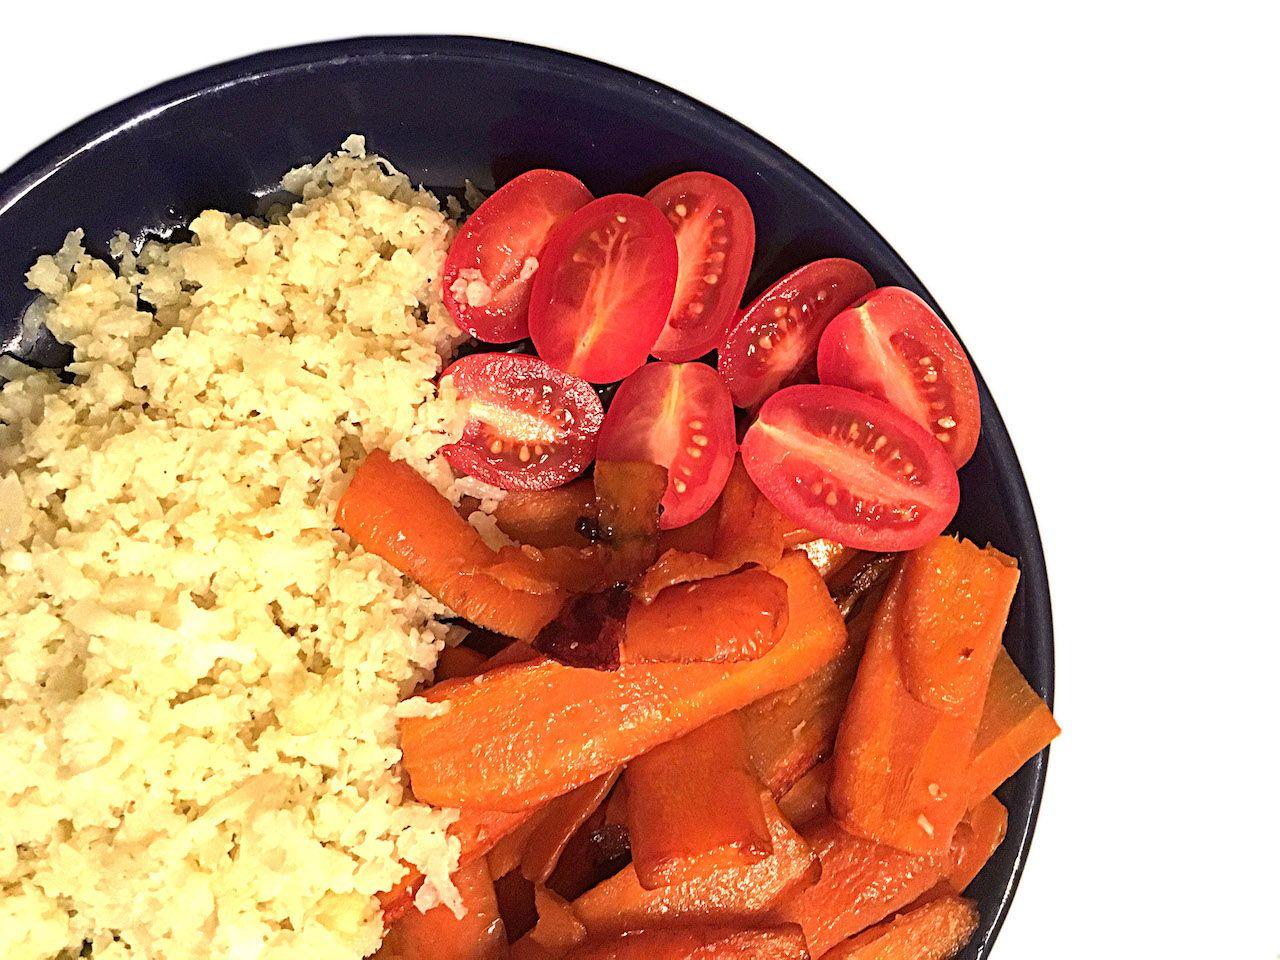 Vegan hostel cooking recipe